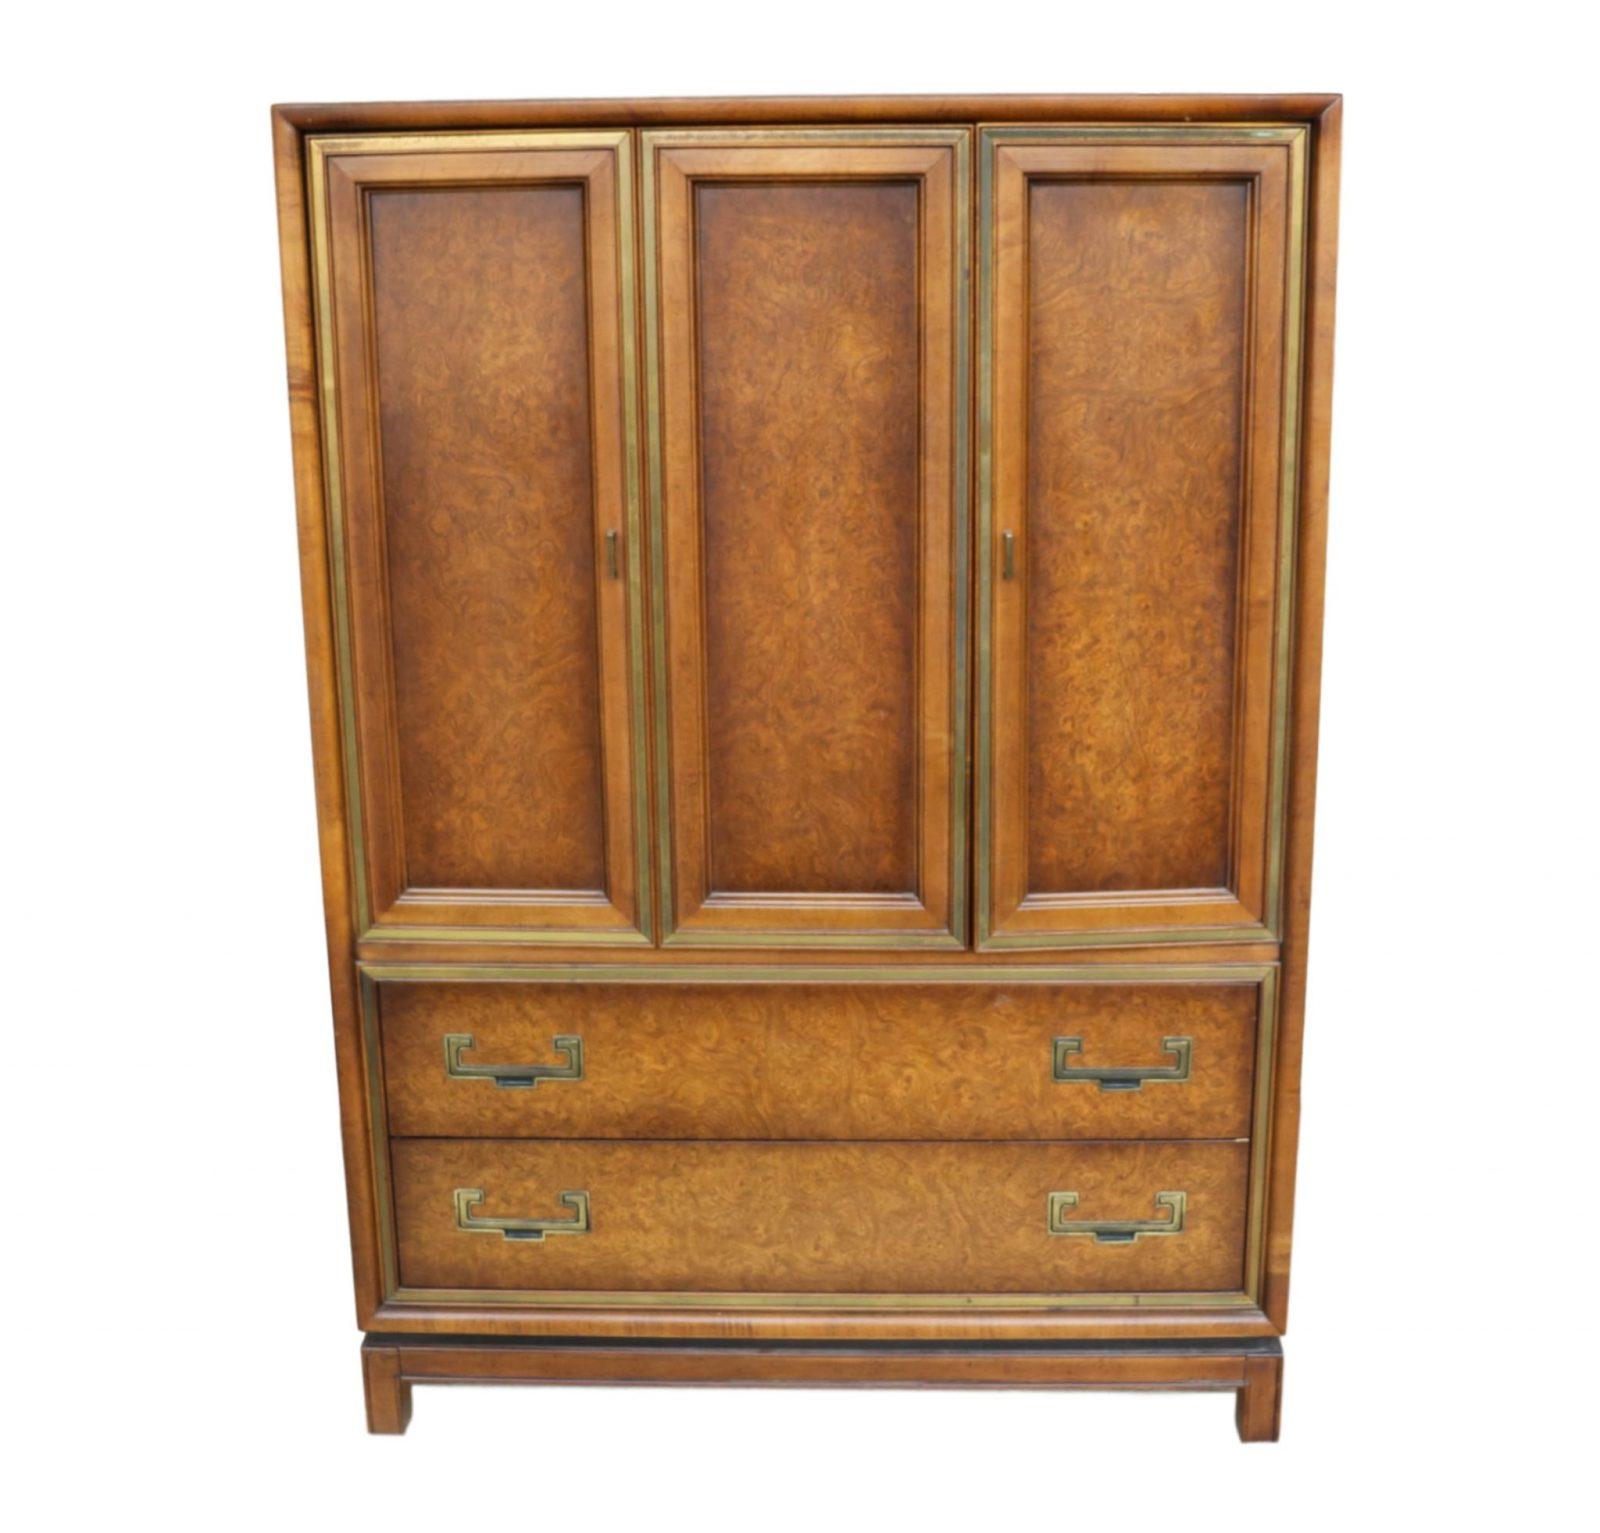 Elegant Founders Mid-Century Burl Wood Highboy Dresser Chest